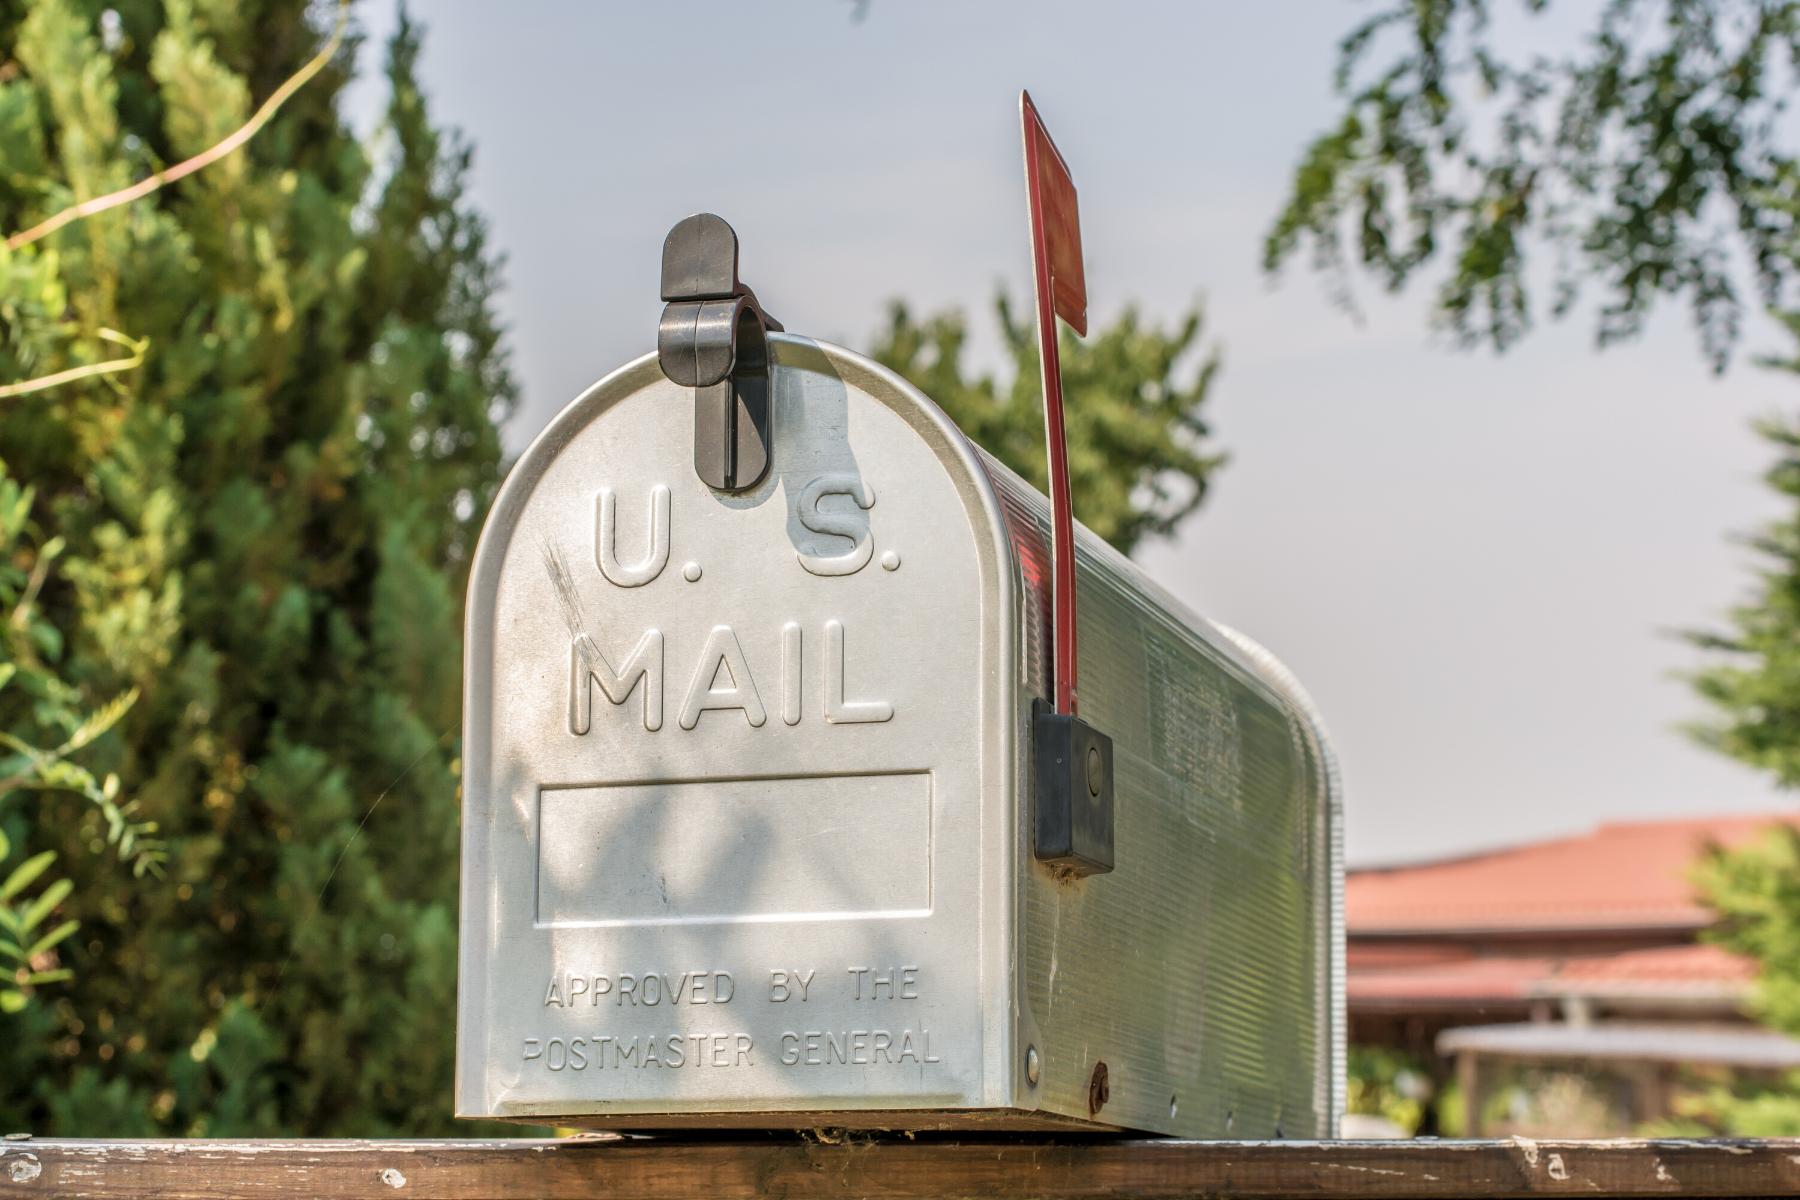 Checking the mailbox